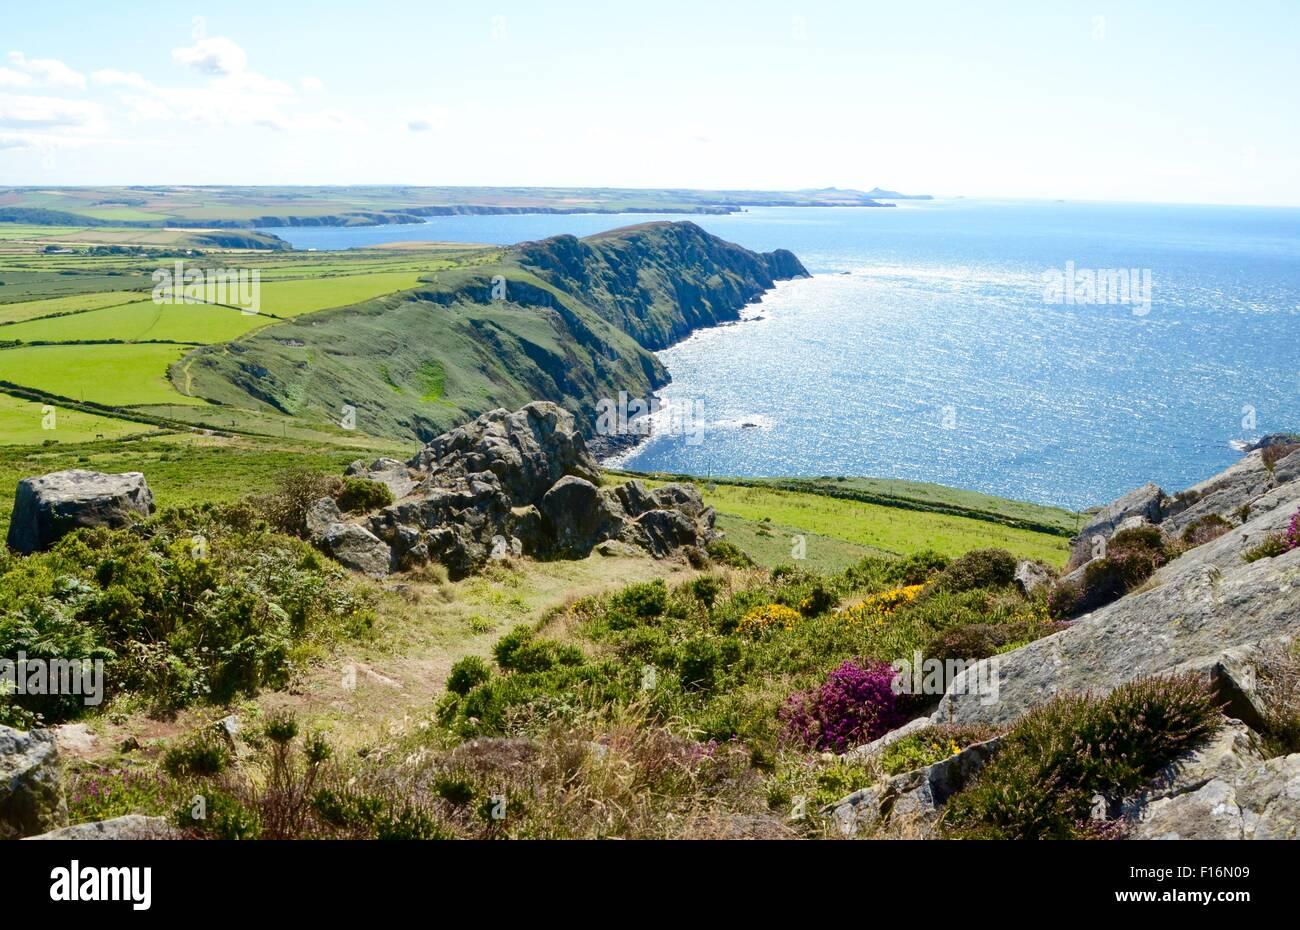 Pwllderi Bay, as seen from y Garn Fawr - Pembrokeshire Coast - Stock Image